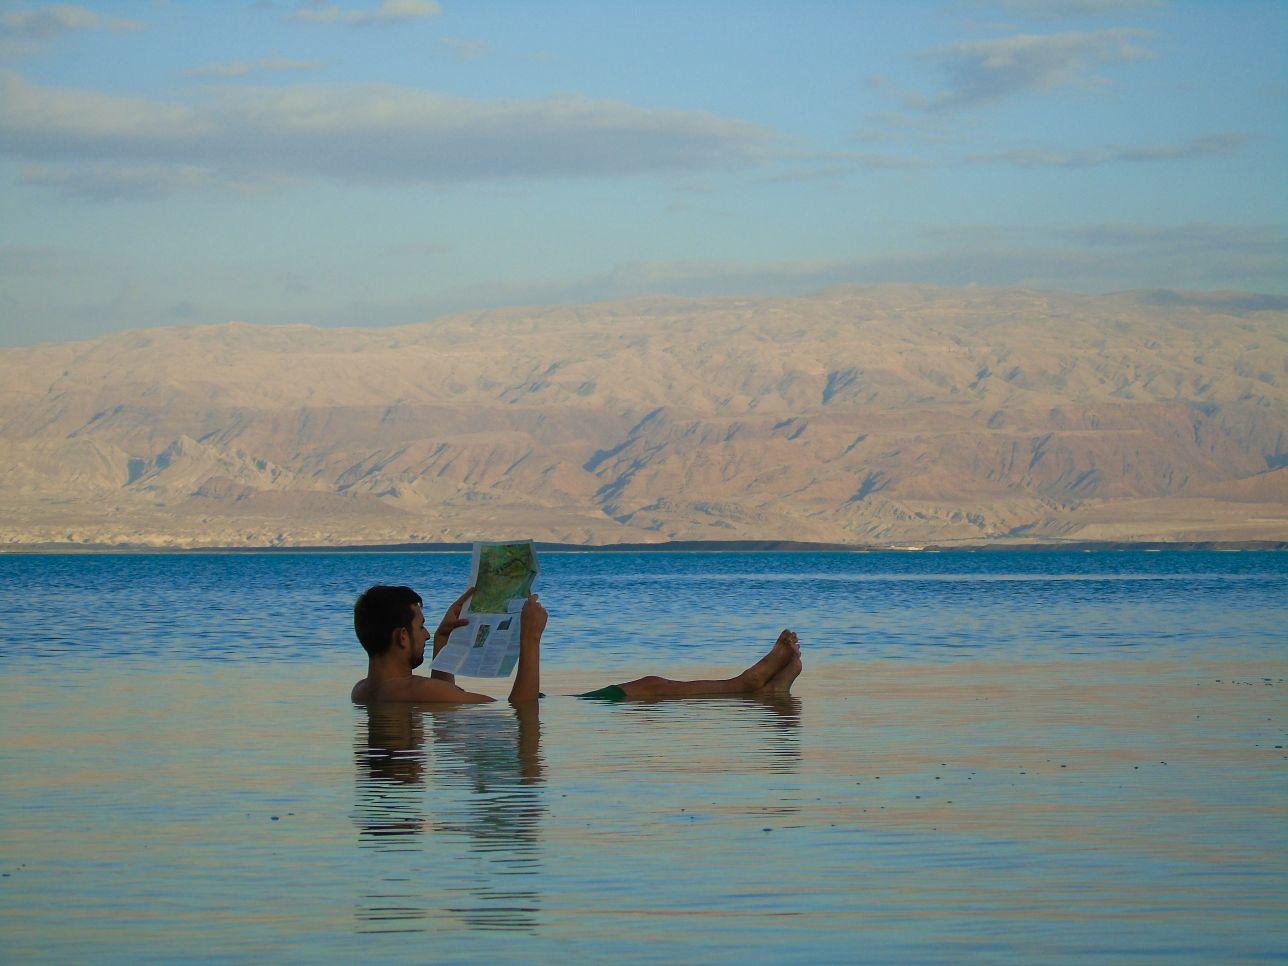 Morze Martwe to niesamowita atrakcja Izraela